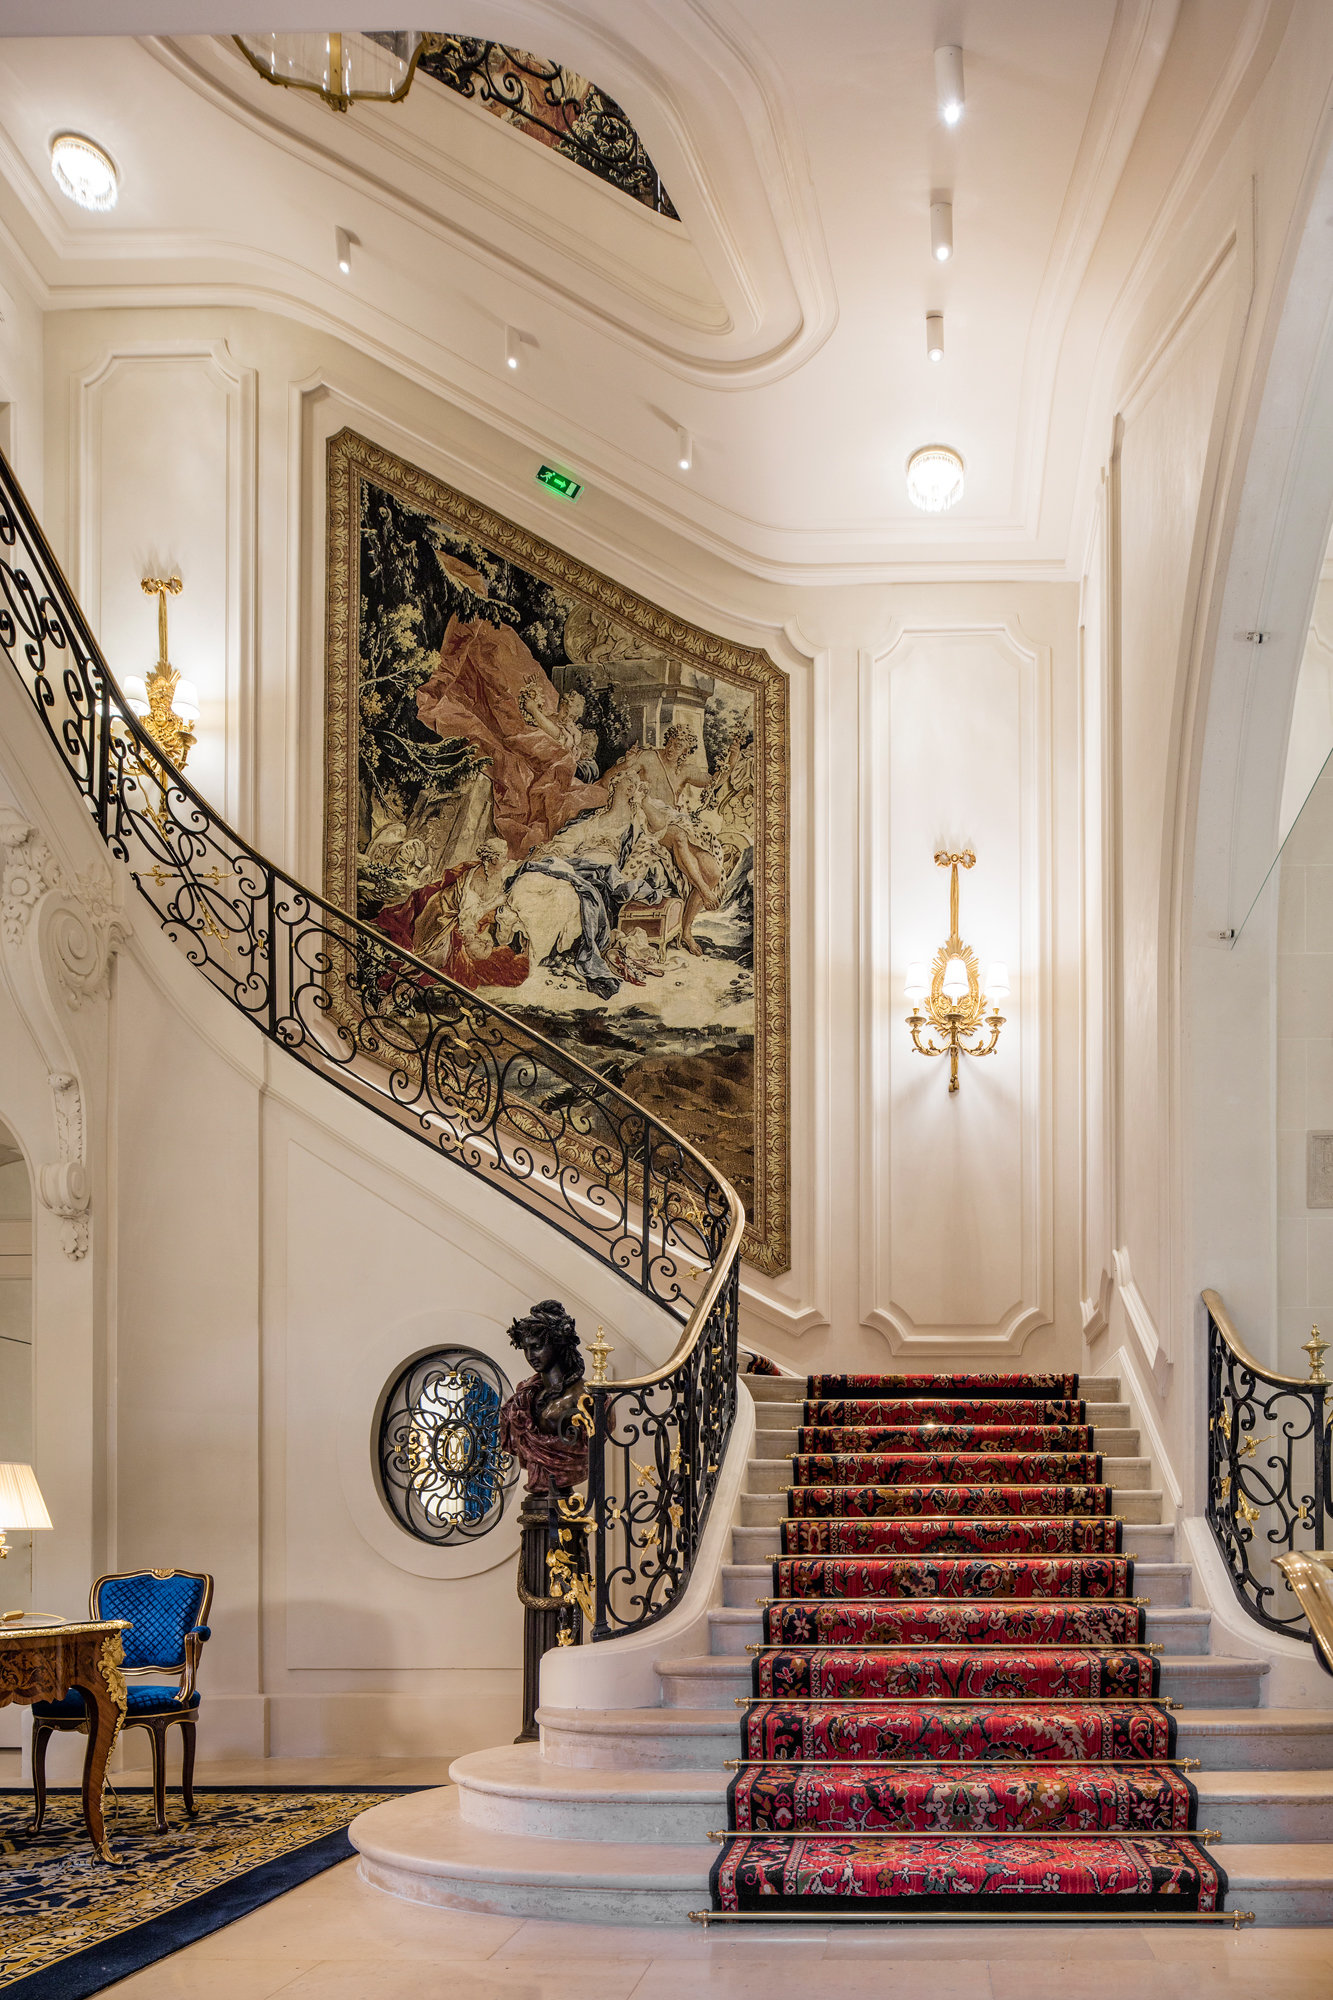 Exploring Renovated Ritz Paris - York Times